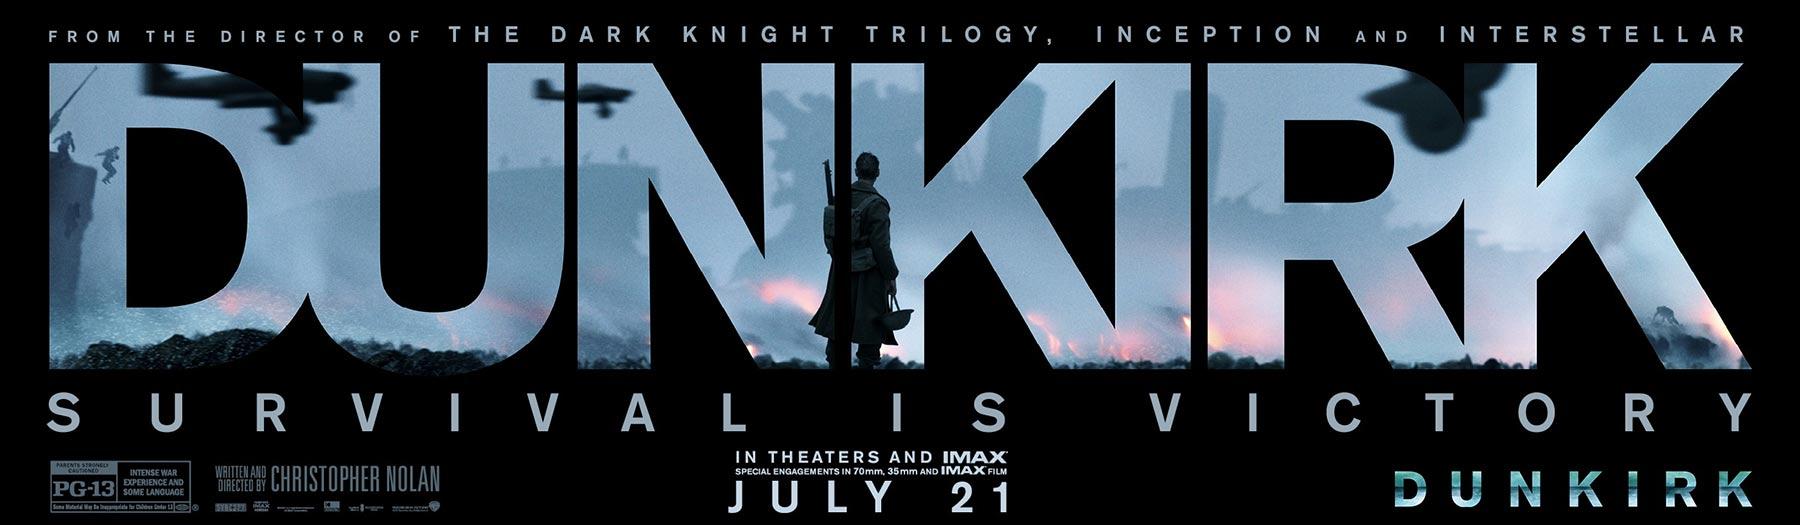 Dunkirk Poster #9